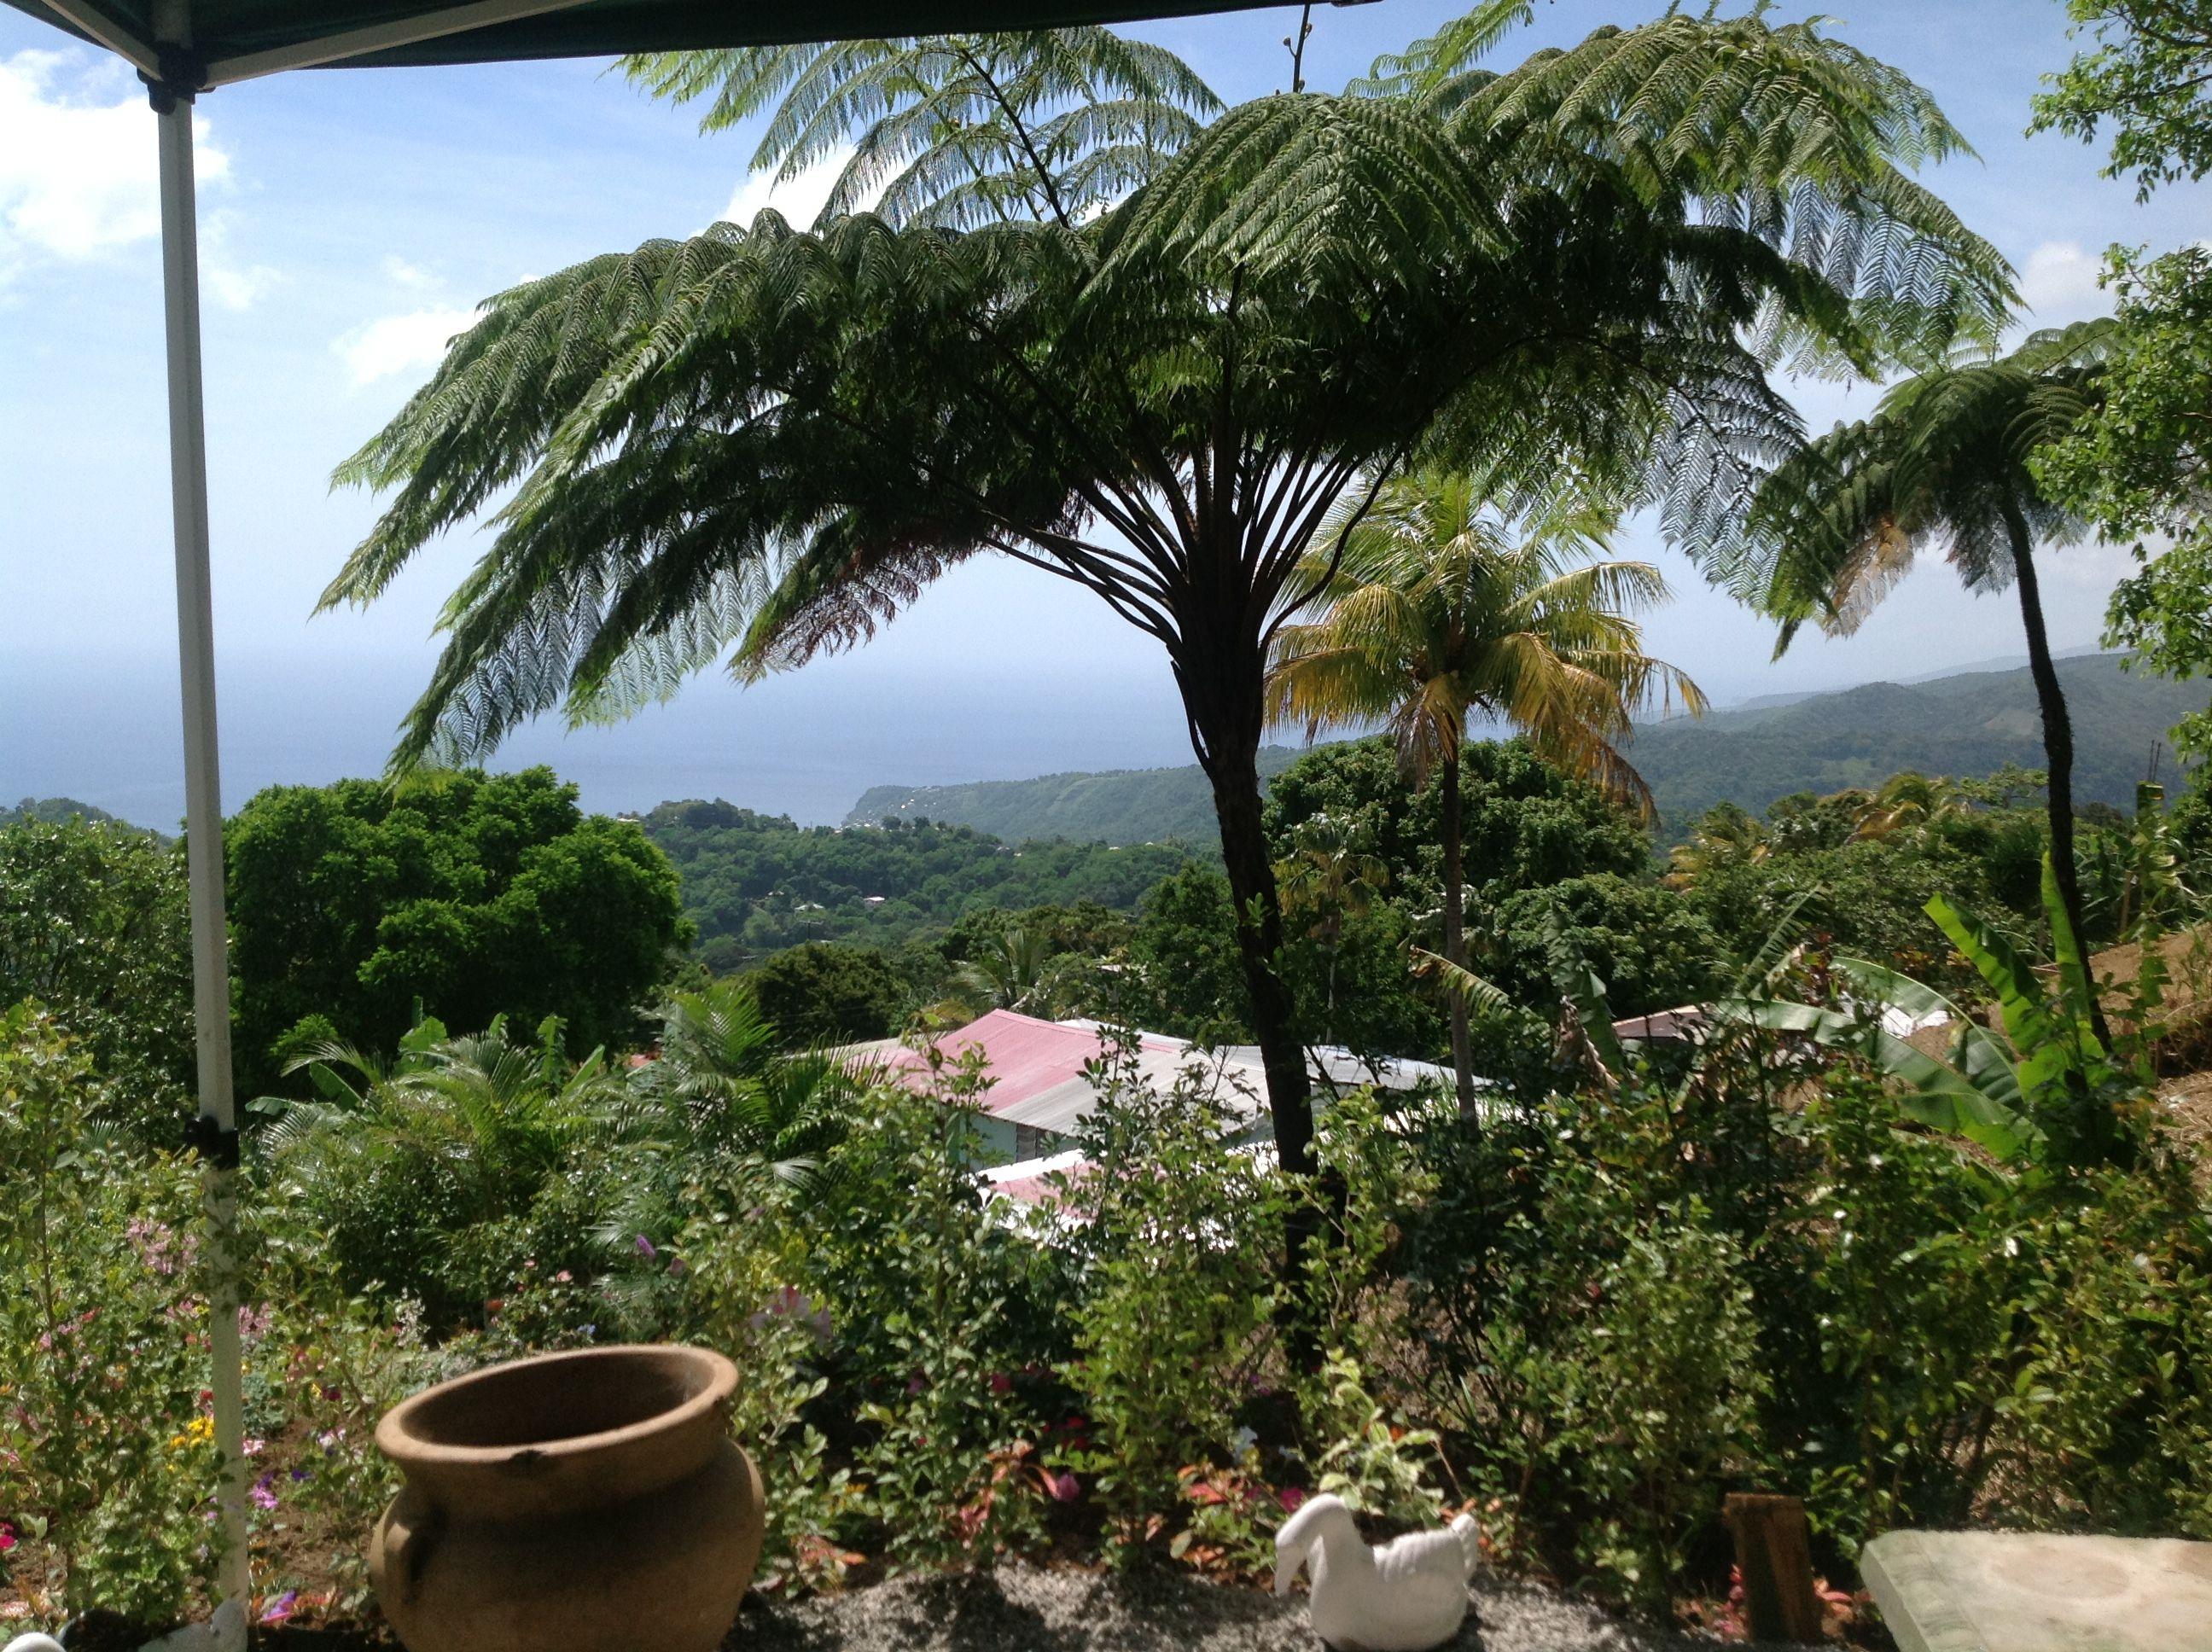 Ferne tree. Giraudel village. Commonwealth of Dominica